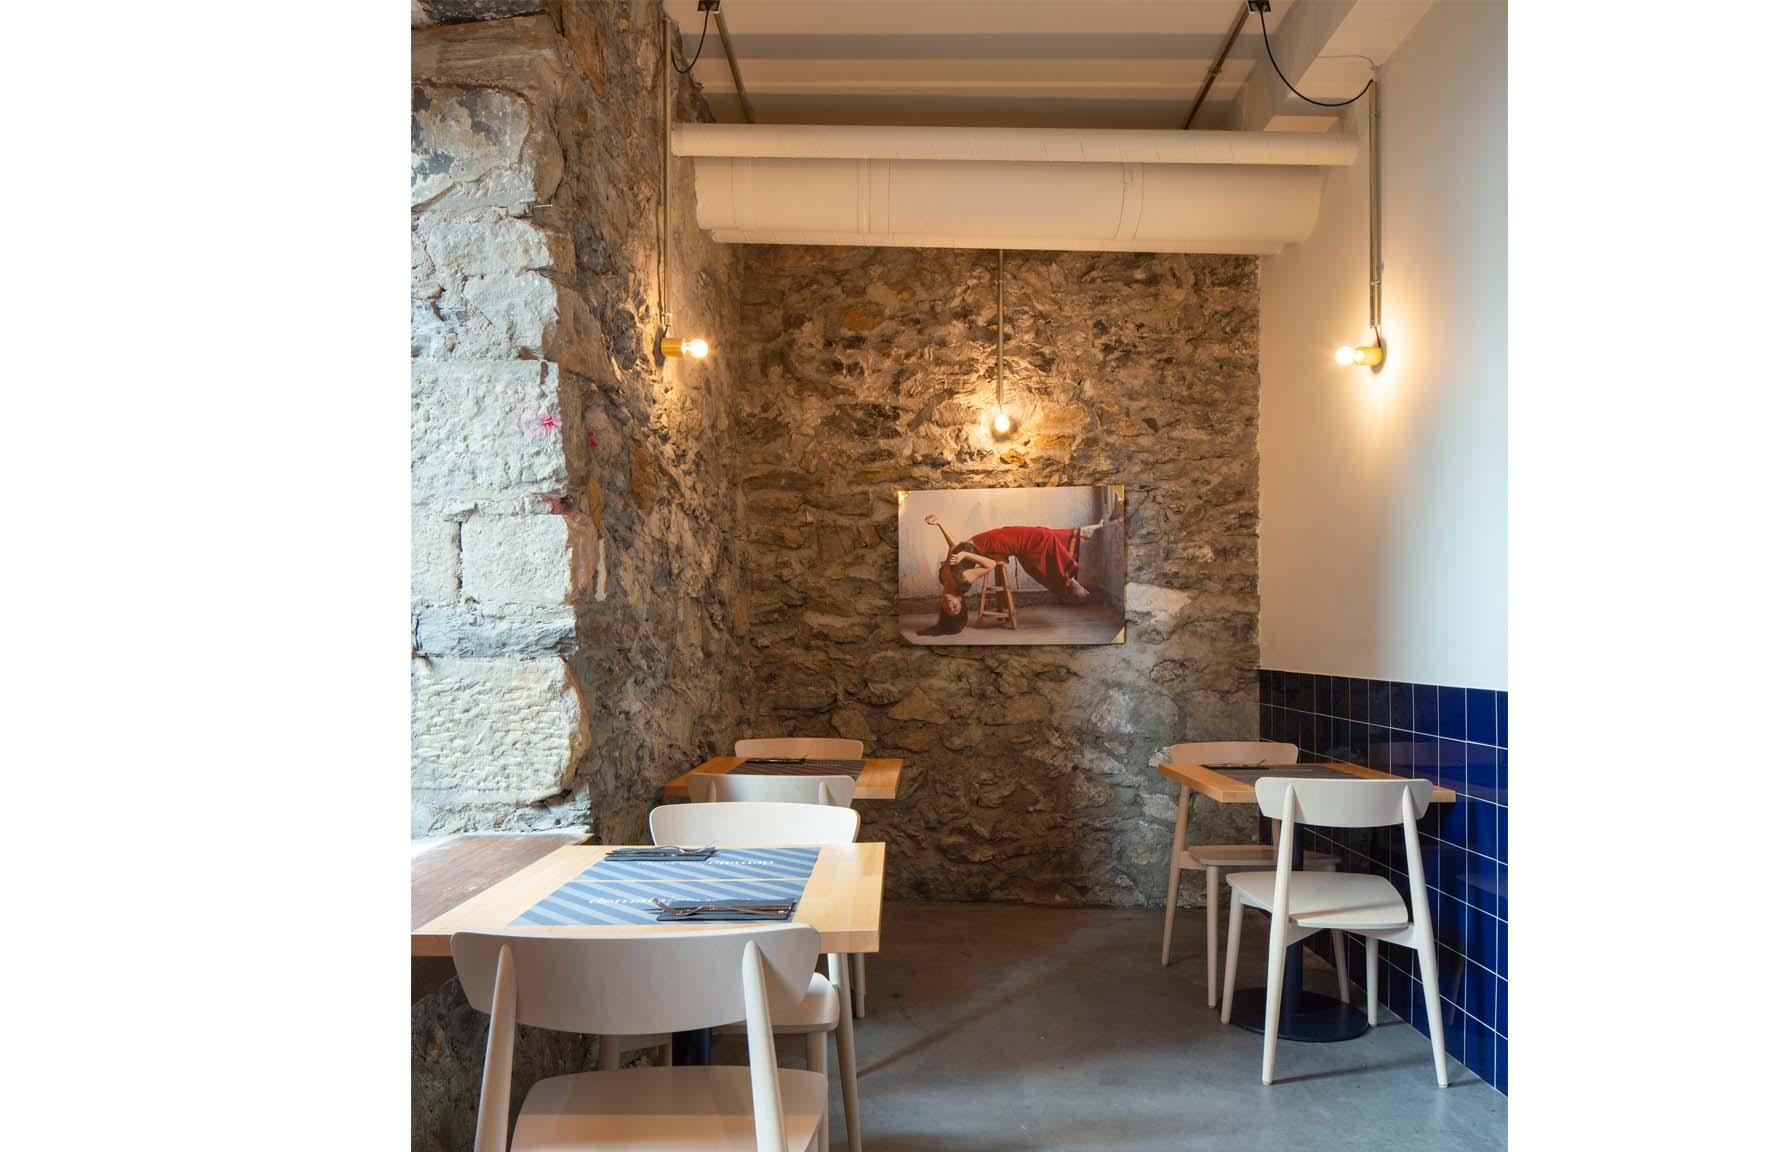 Pizzeria Demaio-Bilbao-Image 04.jpg